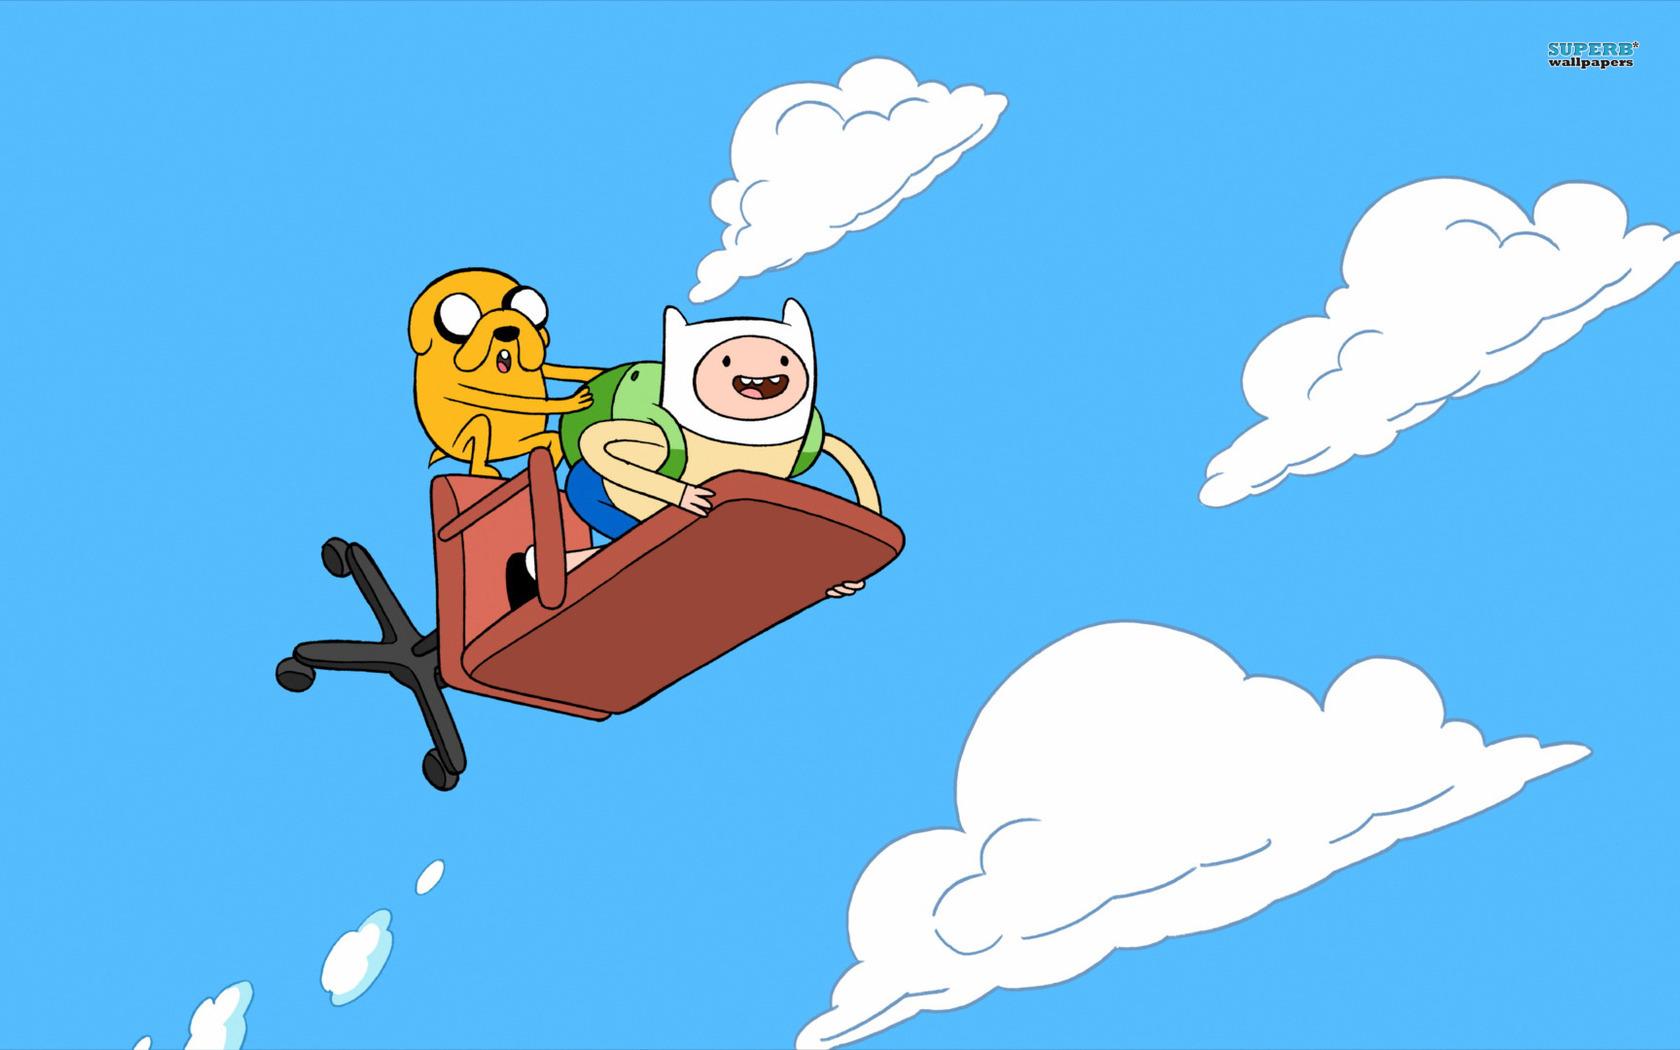 Finn And Jake Adventure Time 1680x1050 pixel Popular HD Wallpaper 1680x1050